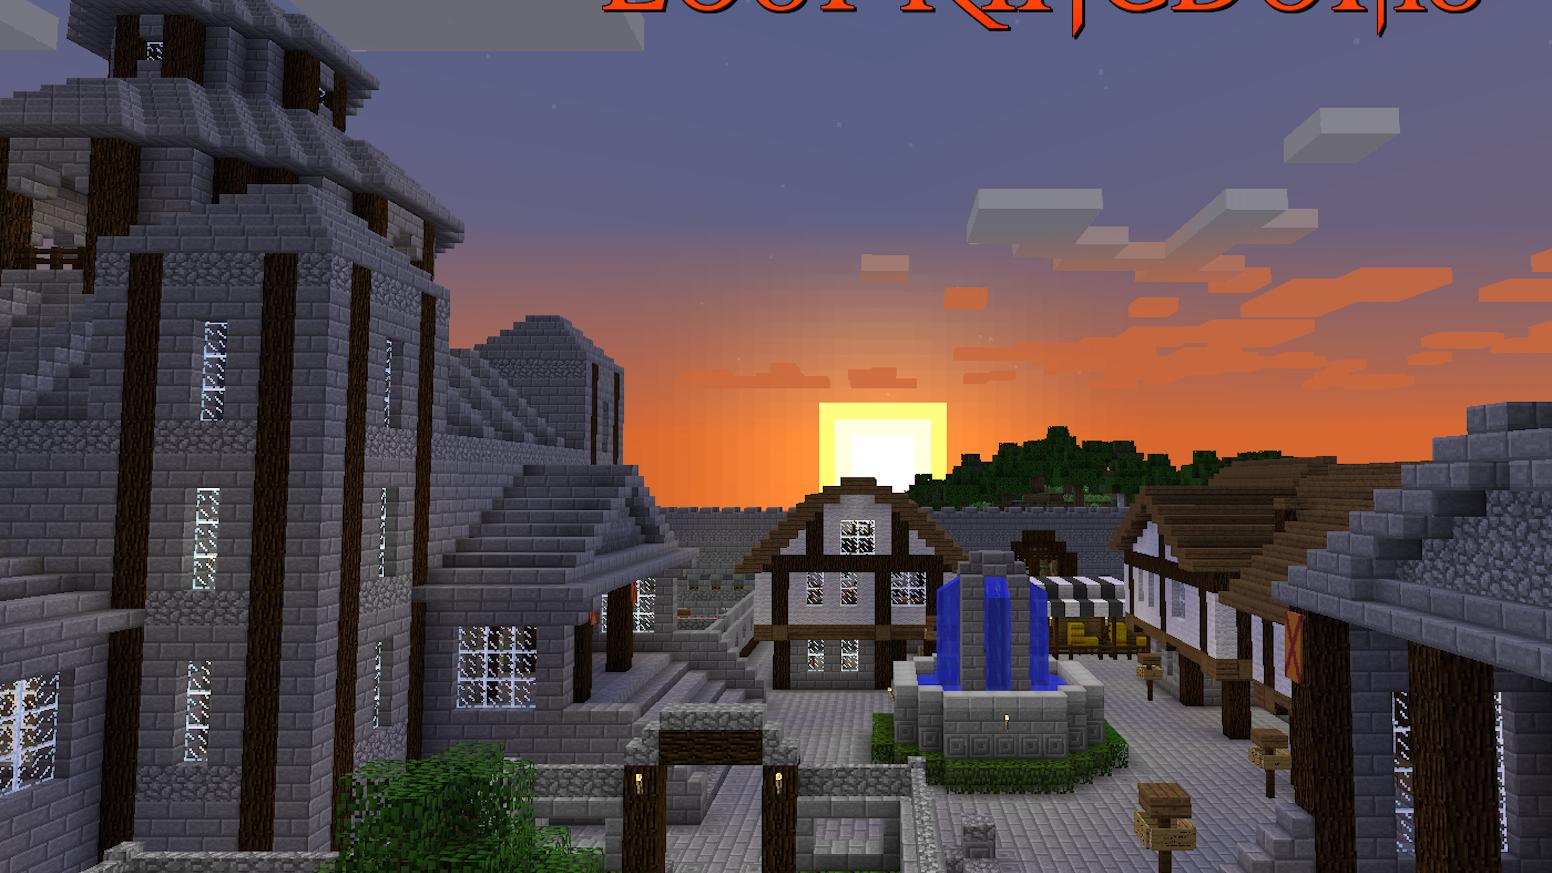 Lost Kingdoms - A Unique Minecraft RPG by ketchupcoke — Kickstarter